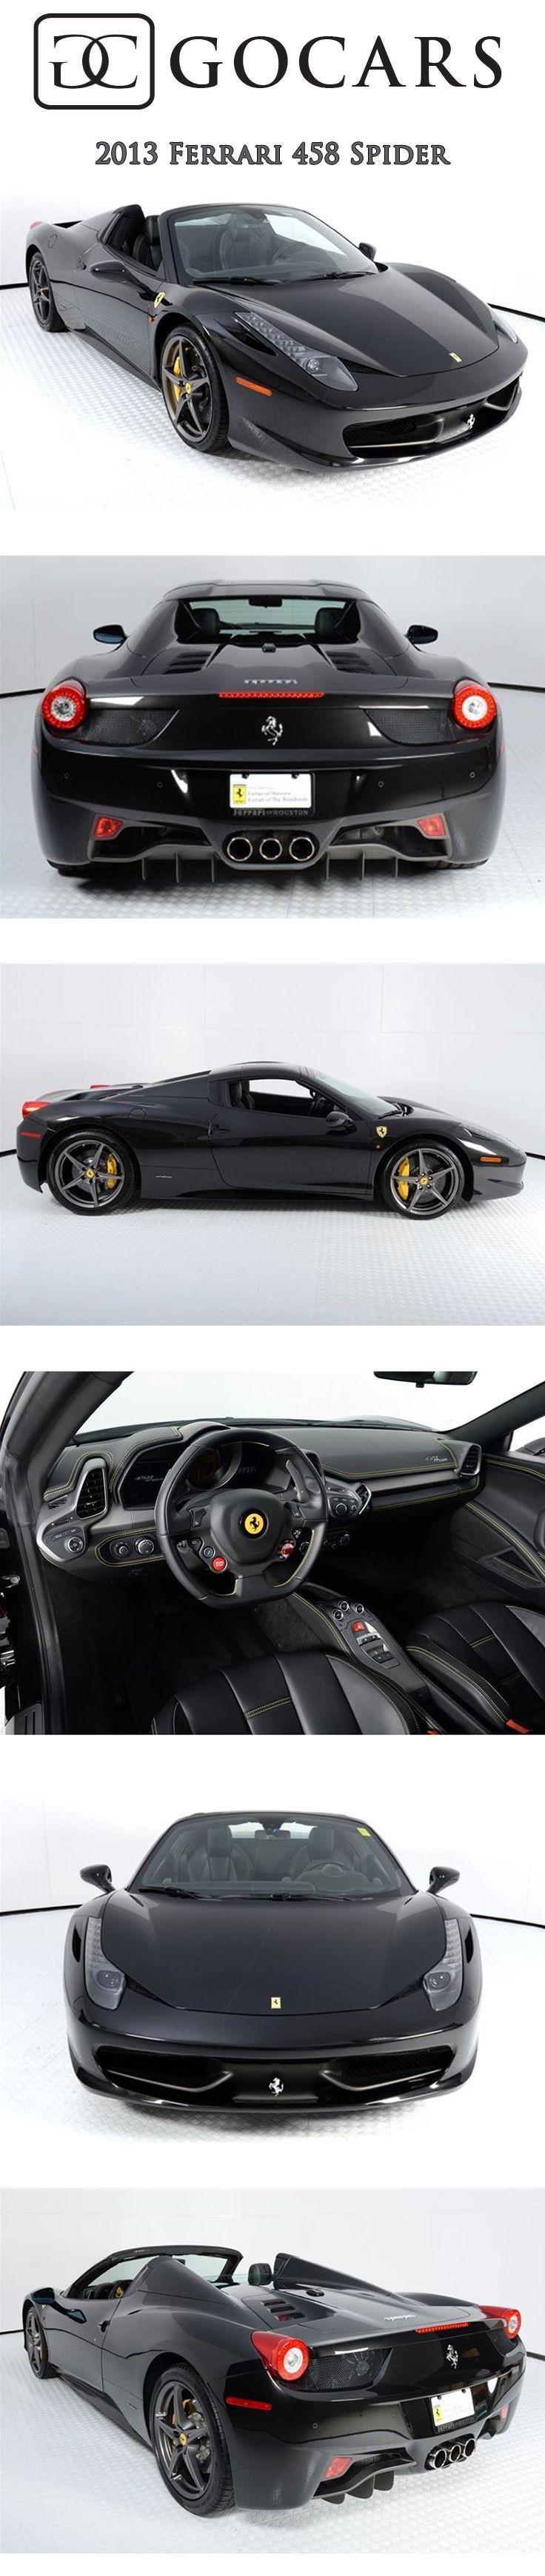 Cool Ferrari 2017: 2013 Ferrari 458 Spider on GoCars Nero Daytona Metallic Exterior #ferrari #ferra... Check more at http://24cars.top/2017/ferrari-2017-2013-ferrari-458-spider-on-gocars-nero-daytona-metallic-exterior-ferrari-ferra/